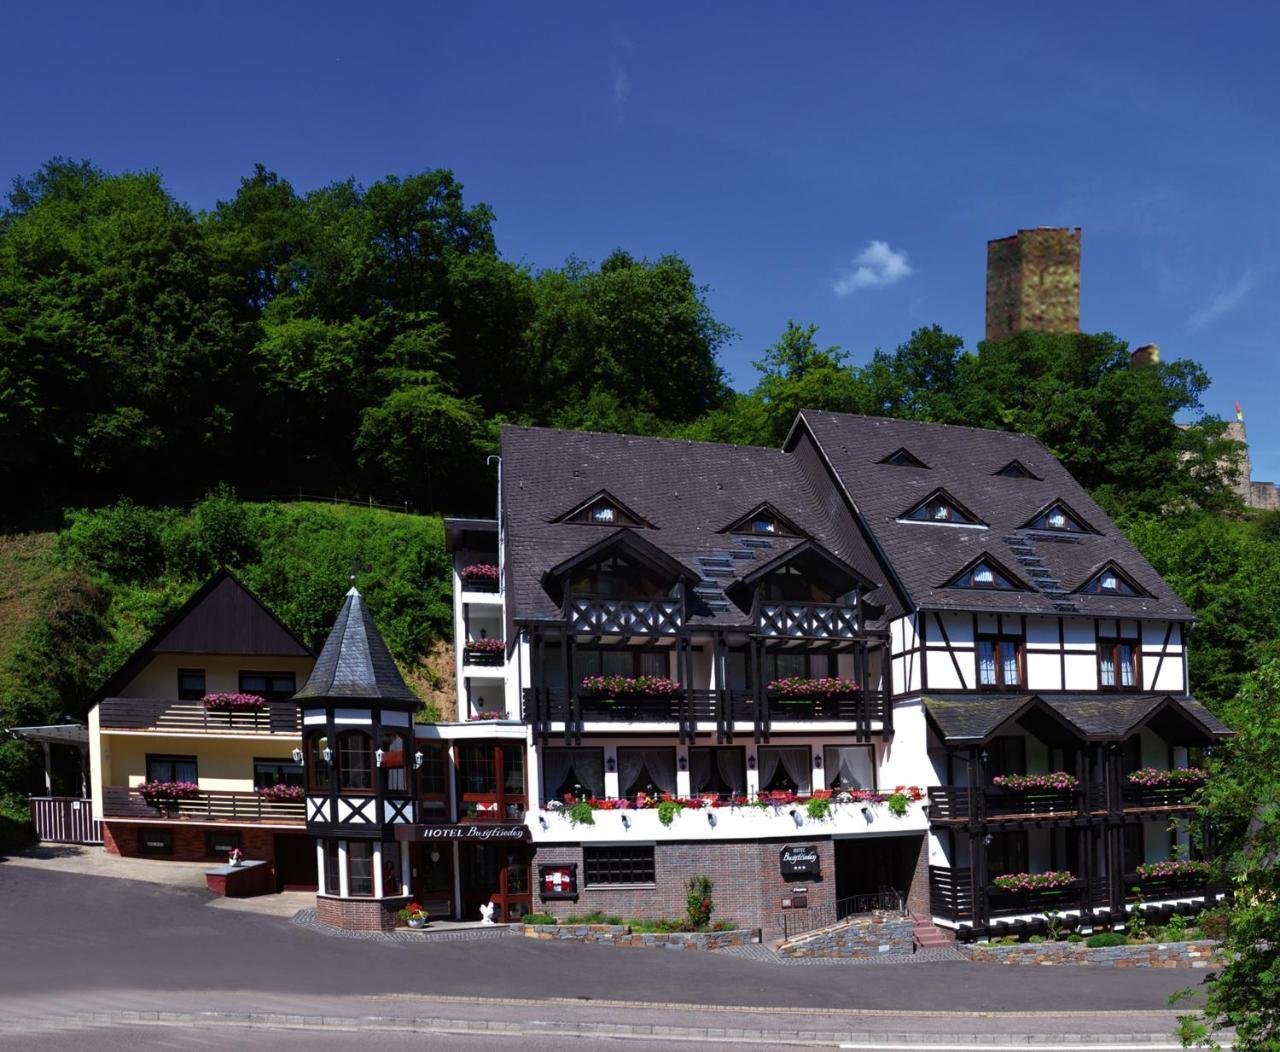 Hotel Burgfrieden Beilstein Moezel